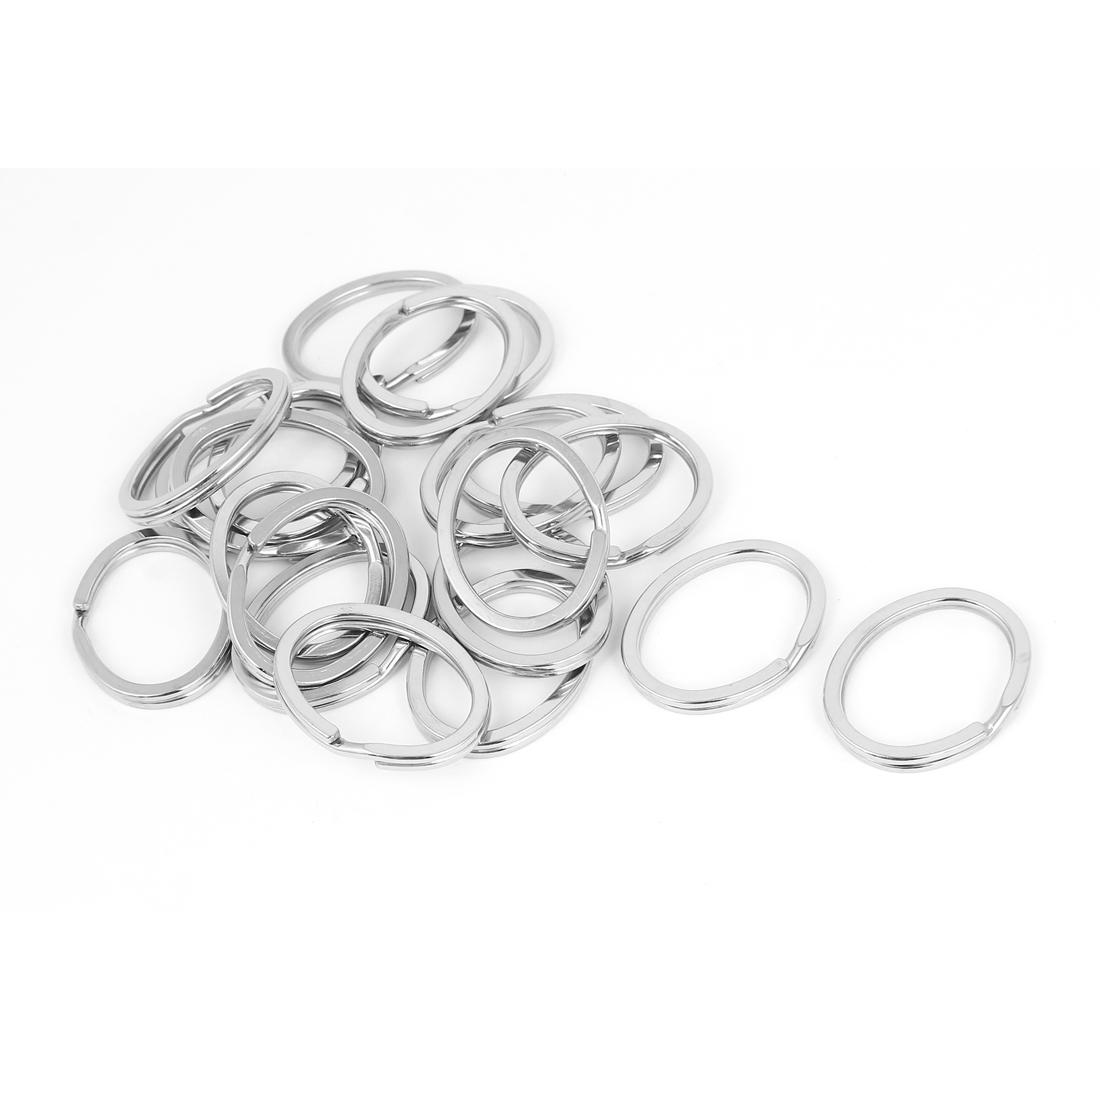 Metal DIY Craft Making Oval Shape Split Ring Keyring Charms Silver Tone 20pcs